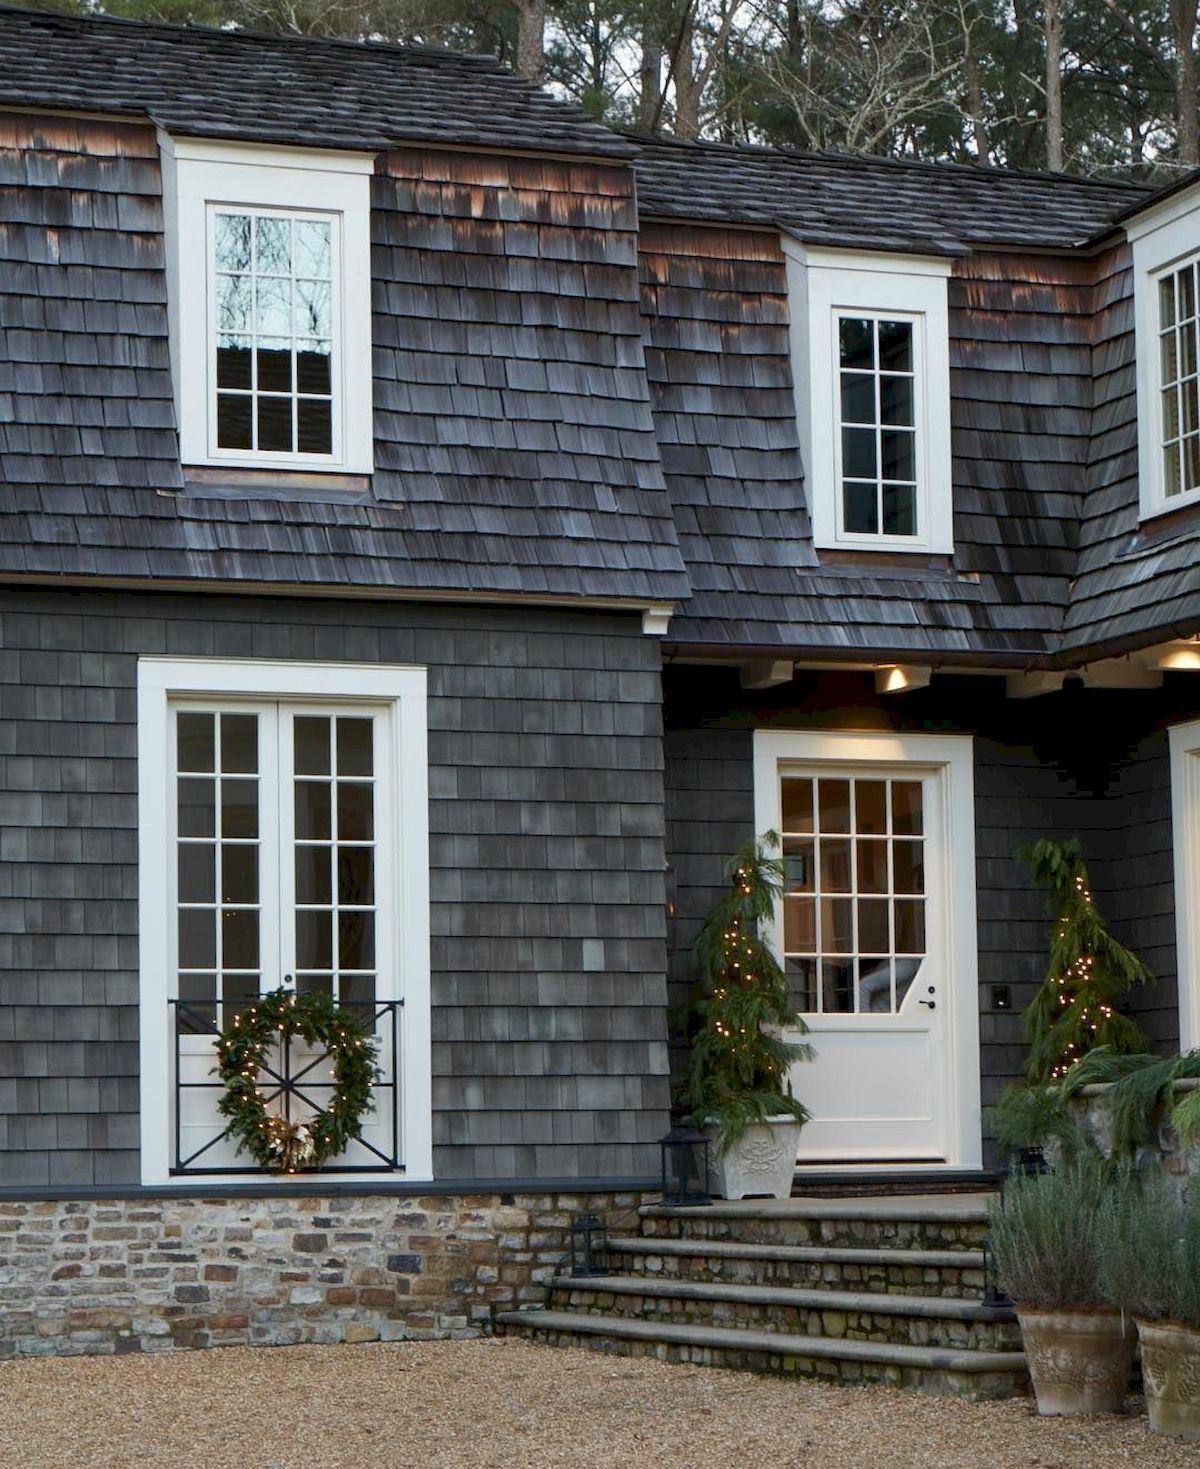 70 Stunning Exterior House Design Ideas (57)